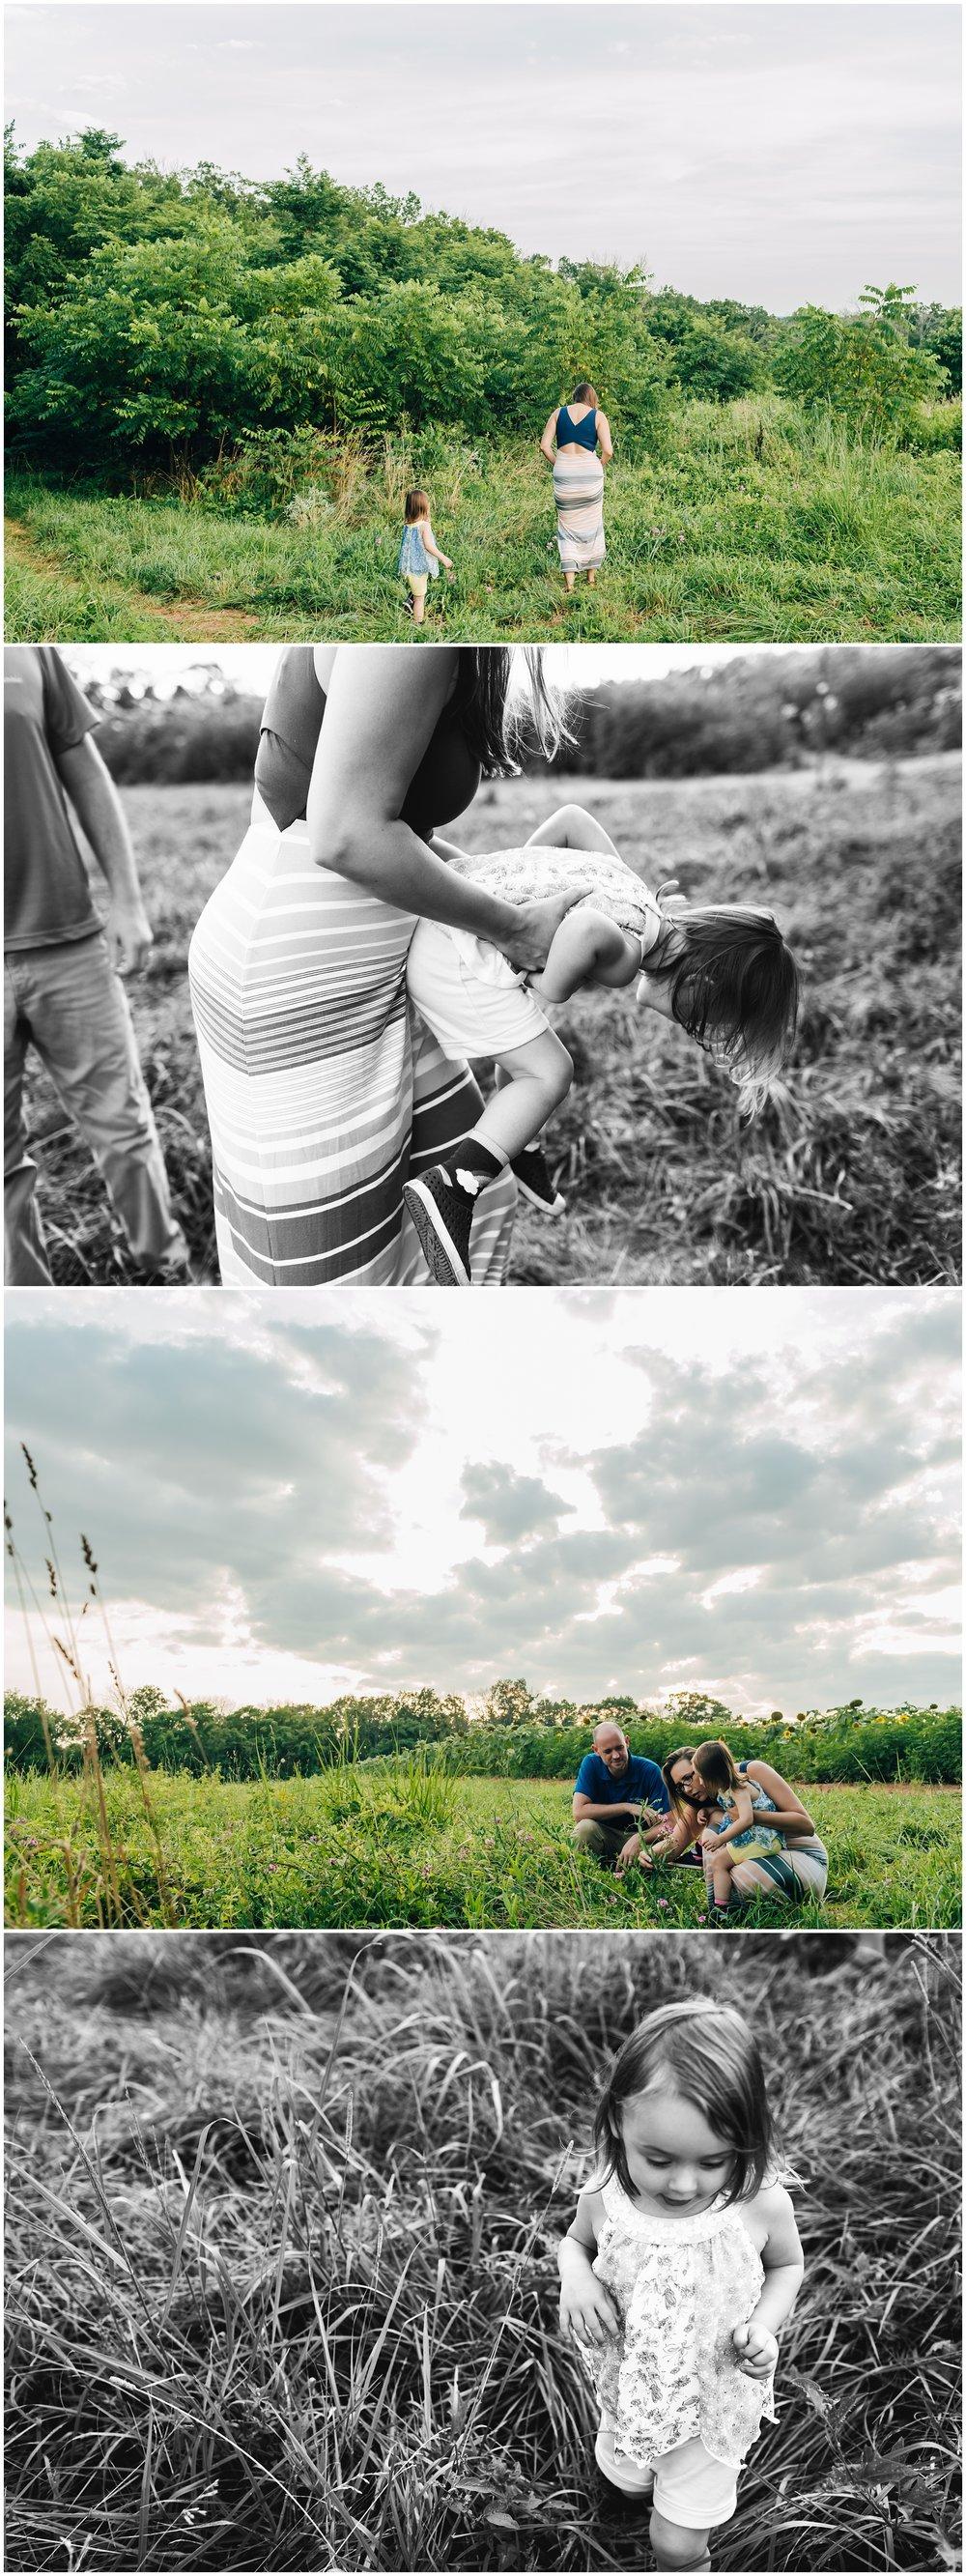 mckee-beshers-sunflowers-family-photography-6.jpg